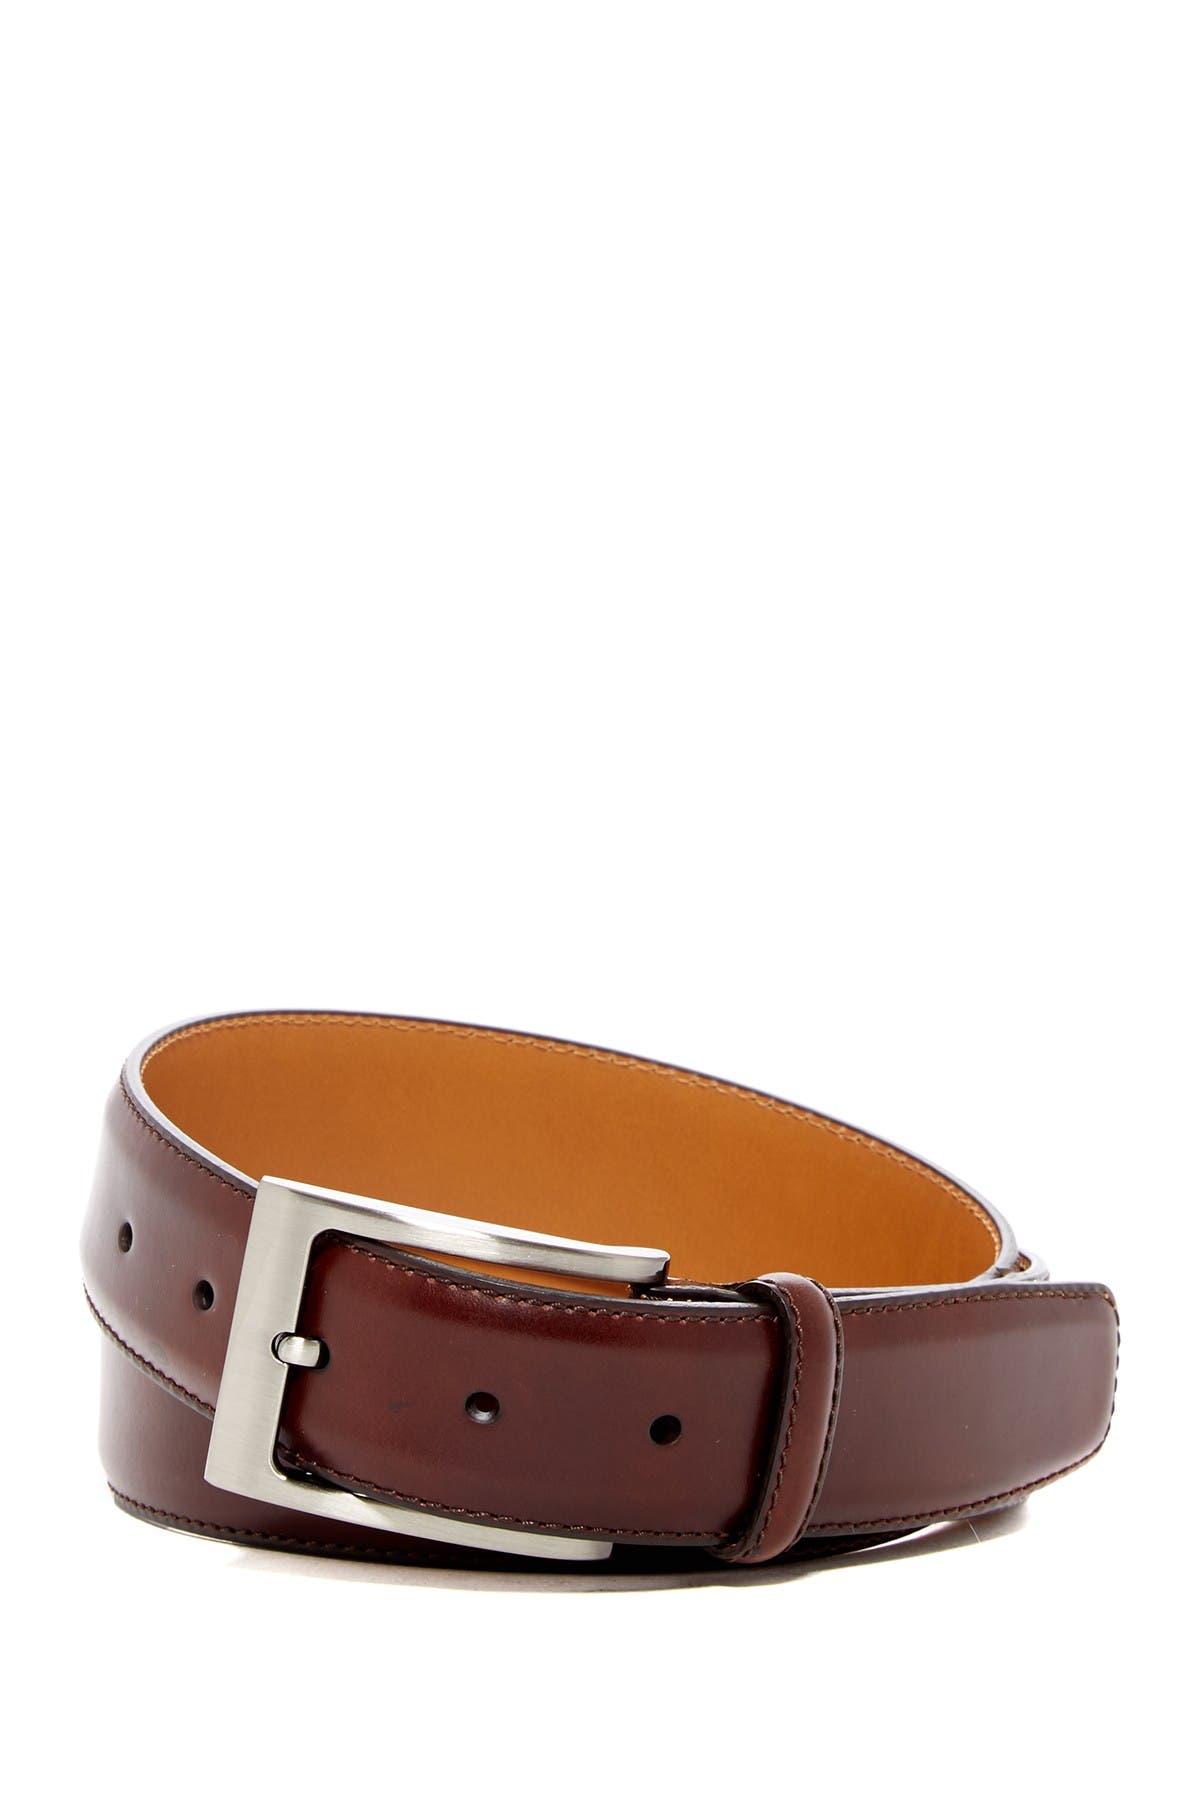 Image of Magnanni Square Buckle Leather Belt